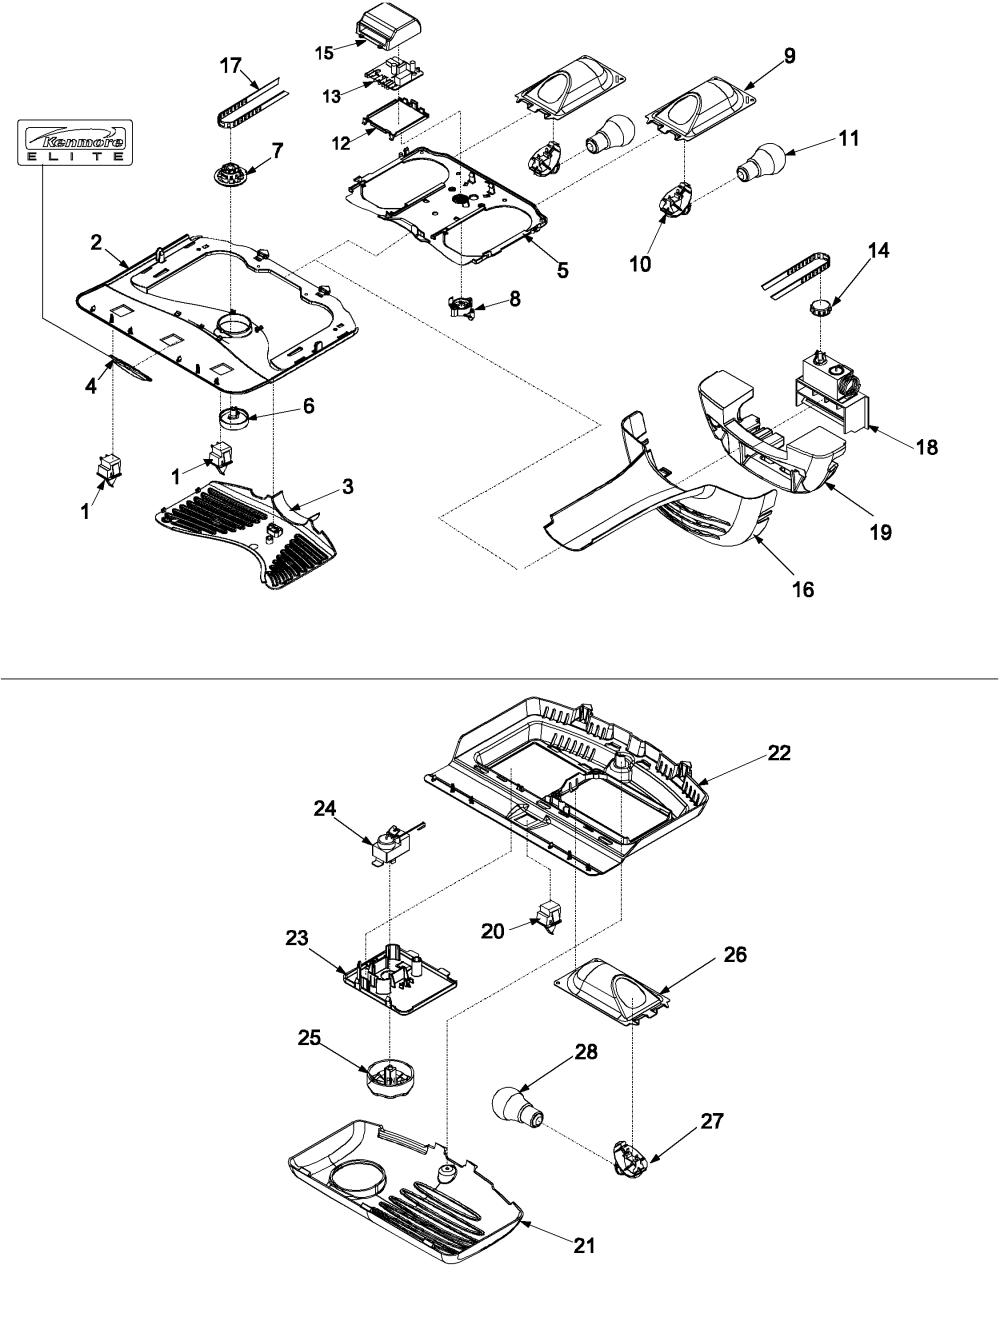 medium resolution of freezer wiring diagrams walk in freezer defrost wiring diagrams freezer defrost wiring diagrams hvac harley davidson